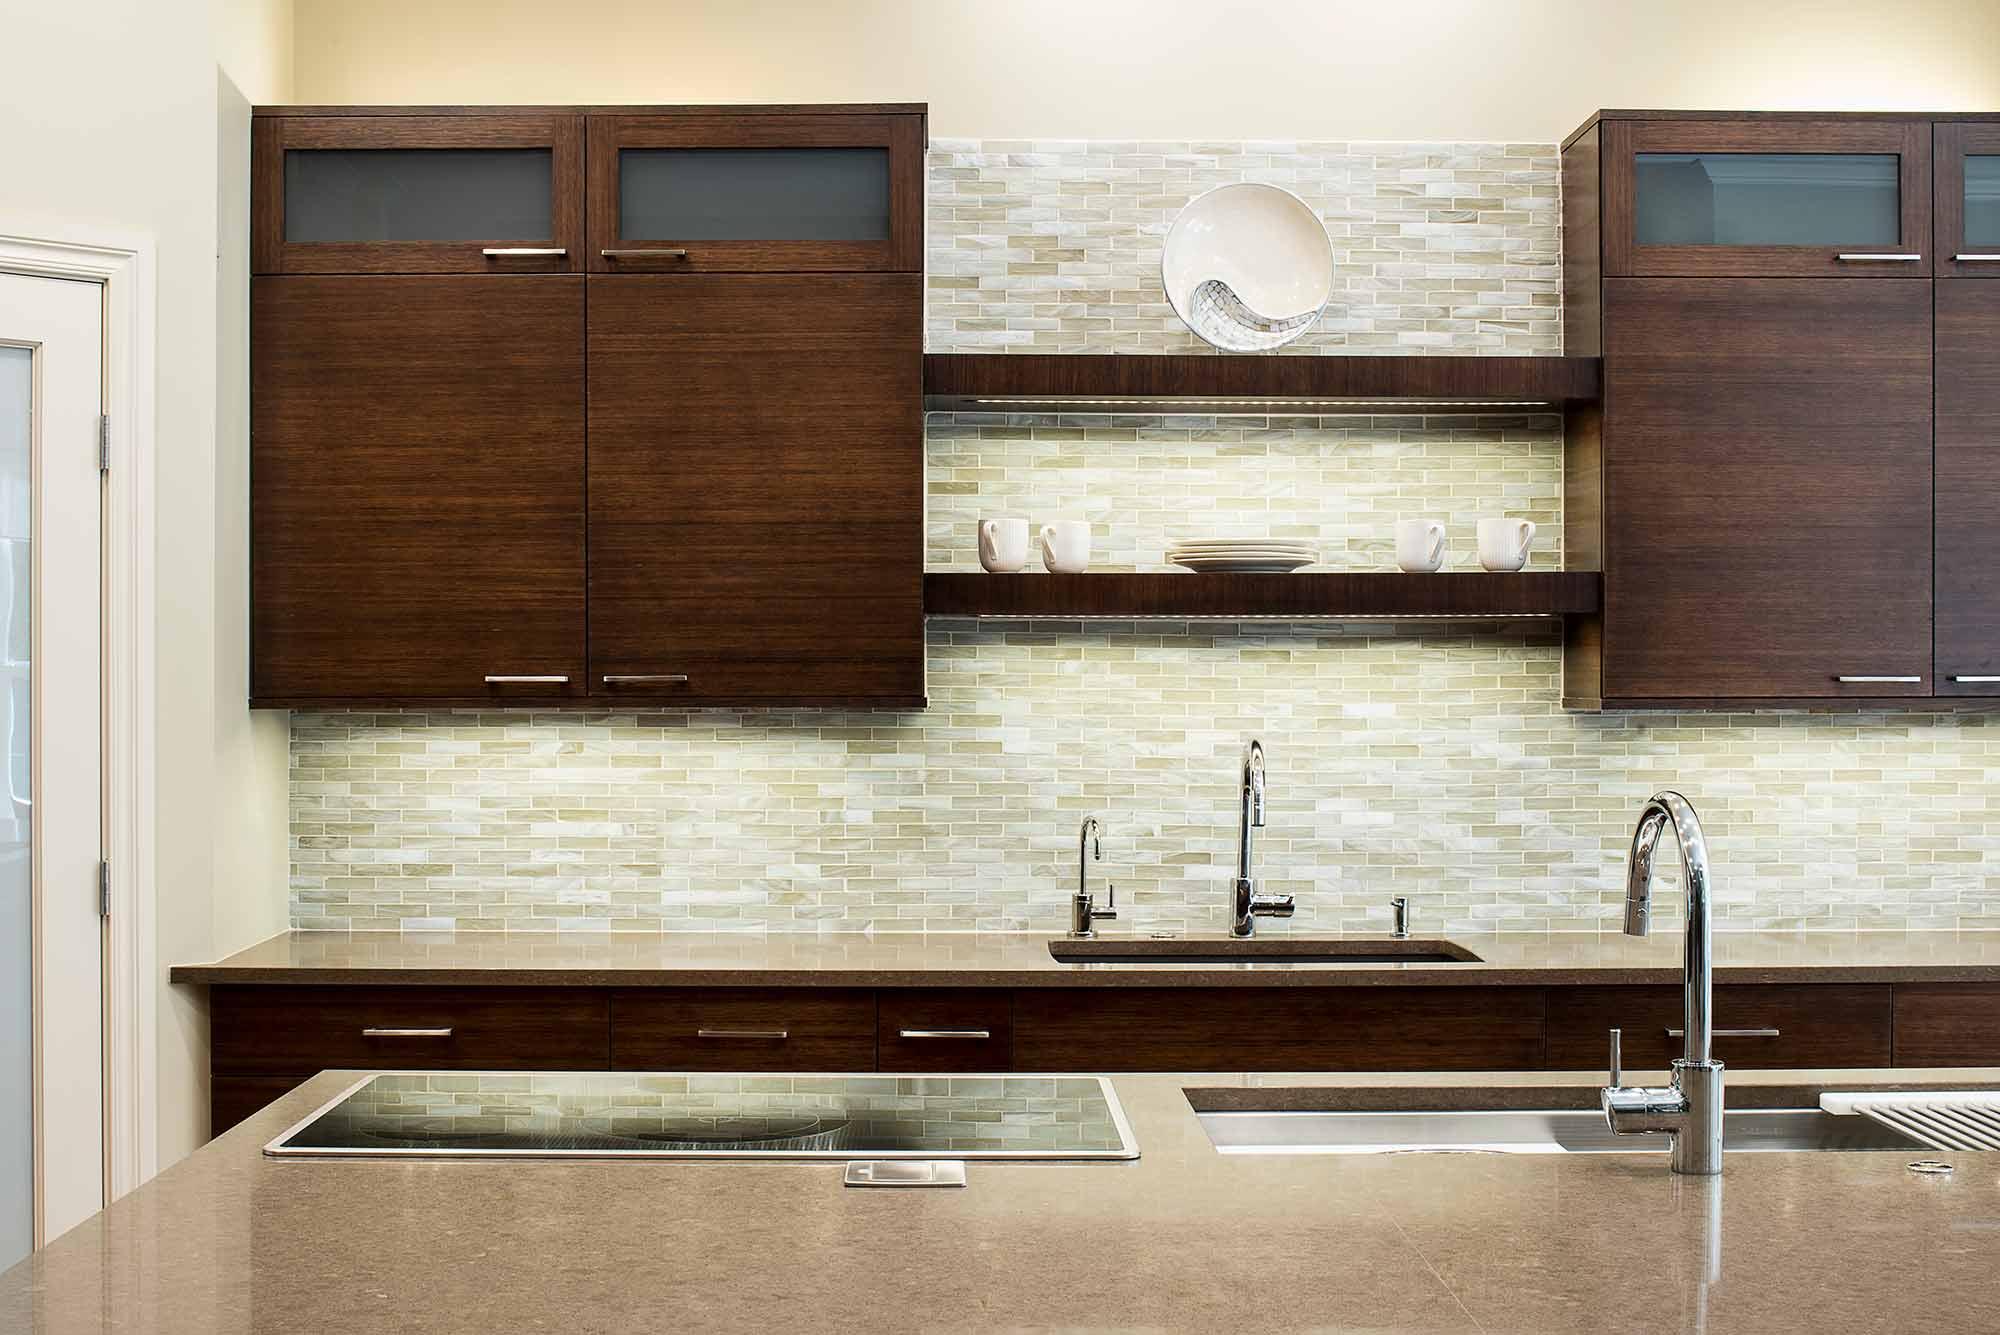 Renewed by bamboo kitchen design tulsa renewed by bamboo iii workwithnaturefo